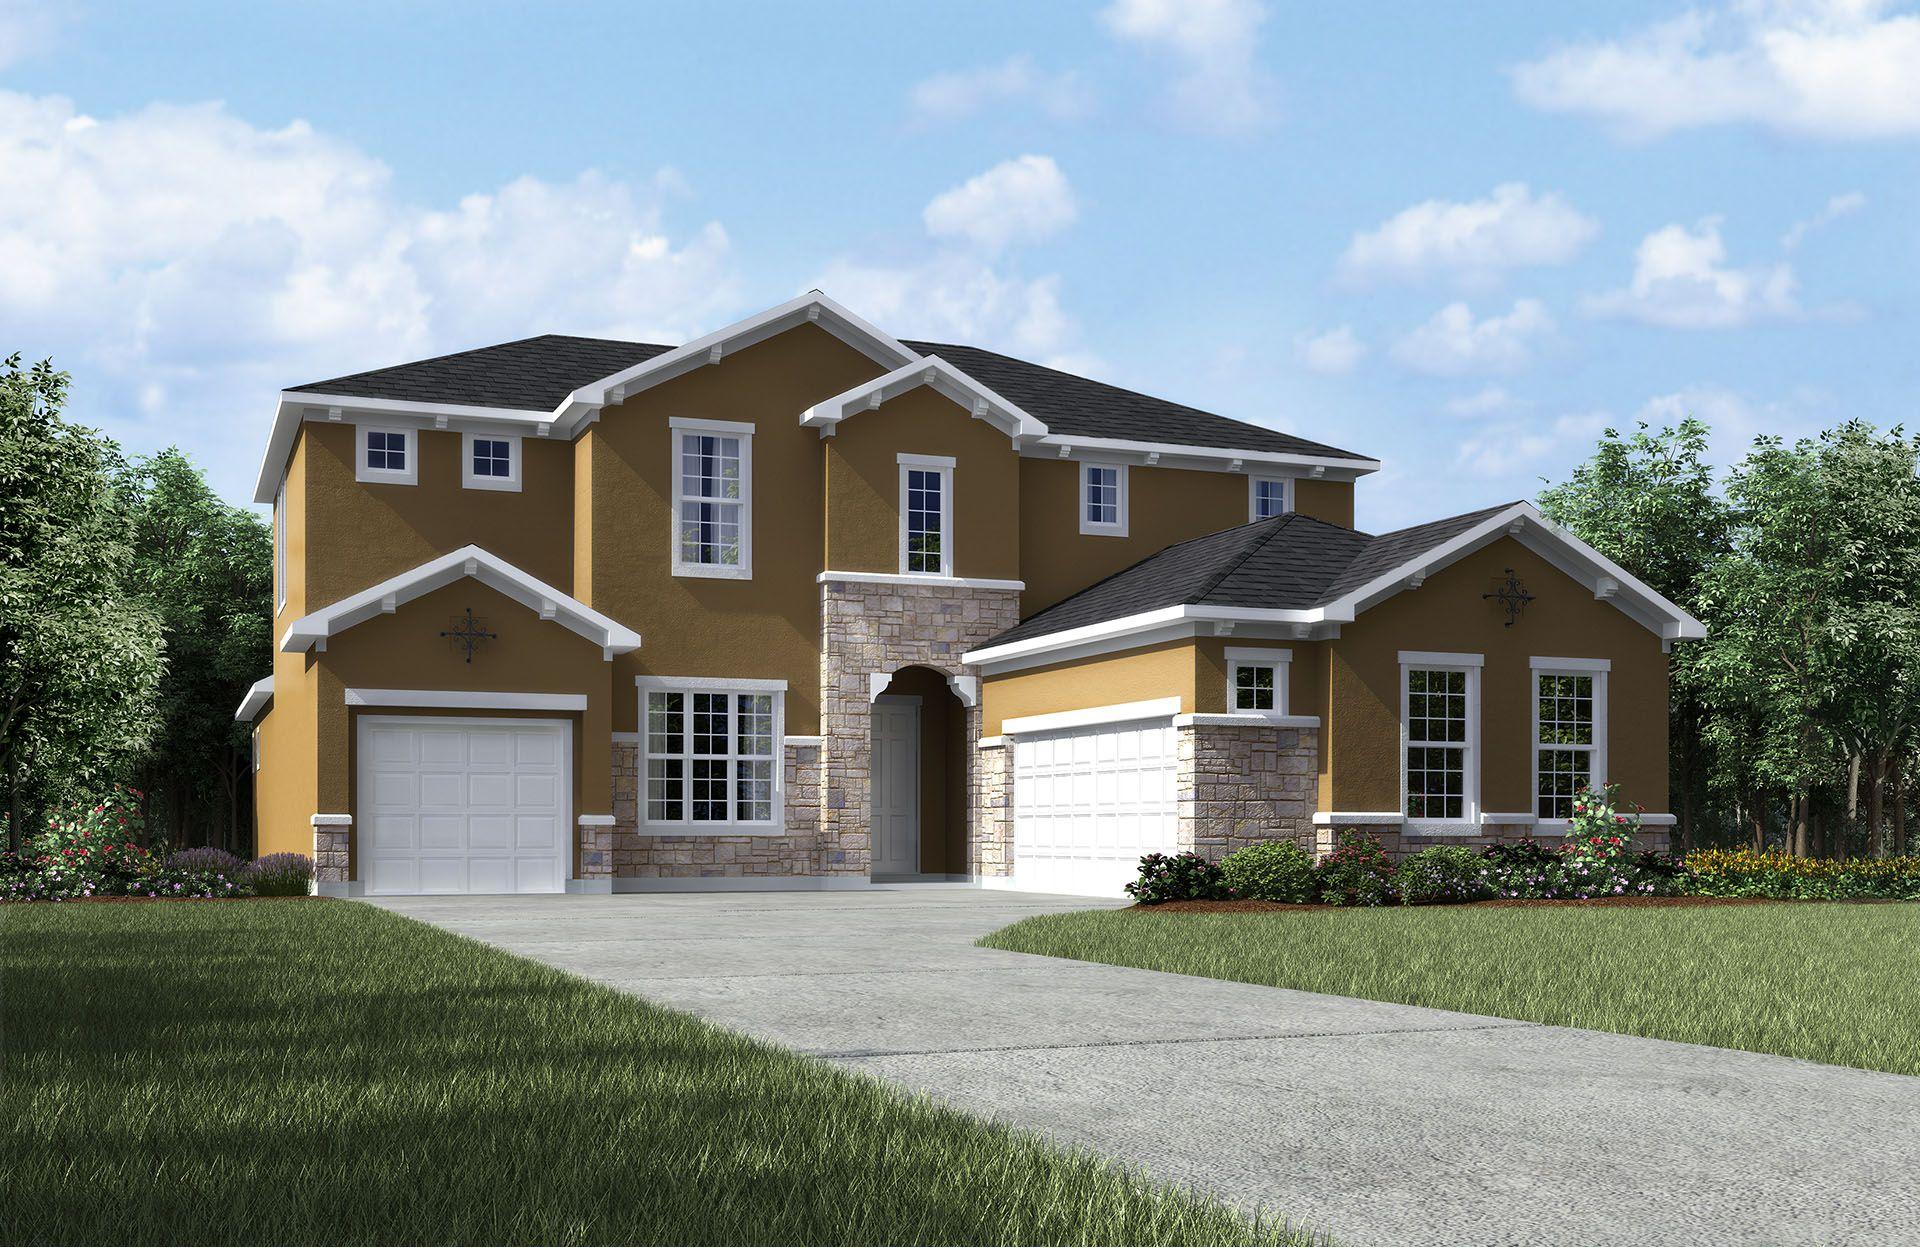 Single Family for Sale at Jacksonville Offsite - Redington Jacksonville, Florida 32257 United States